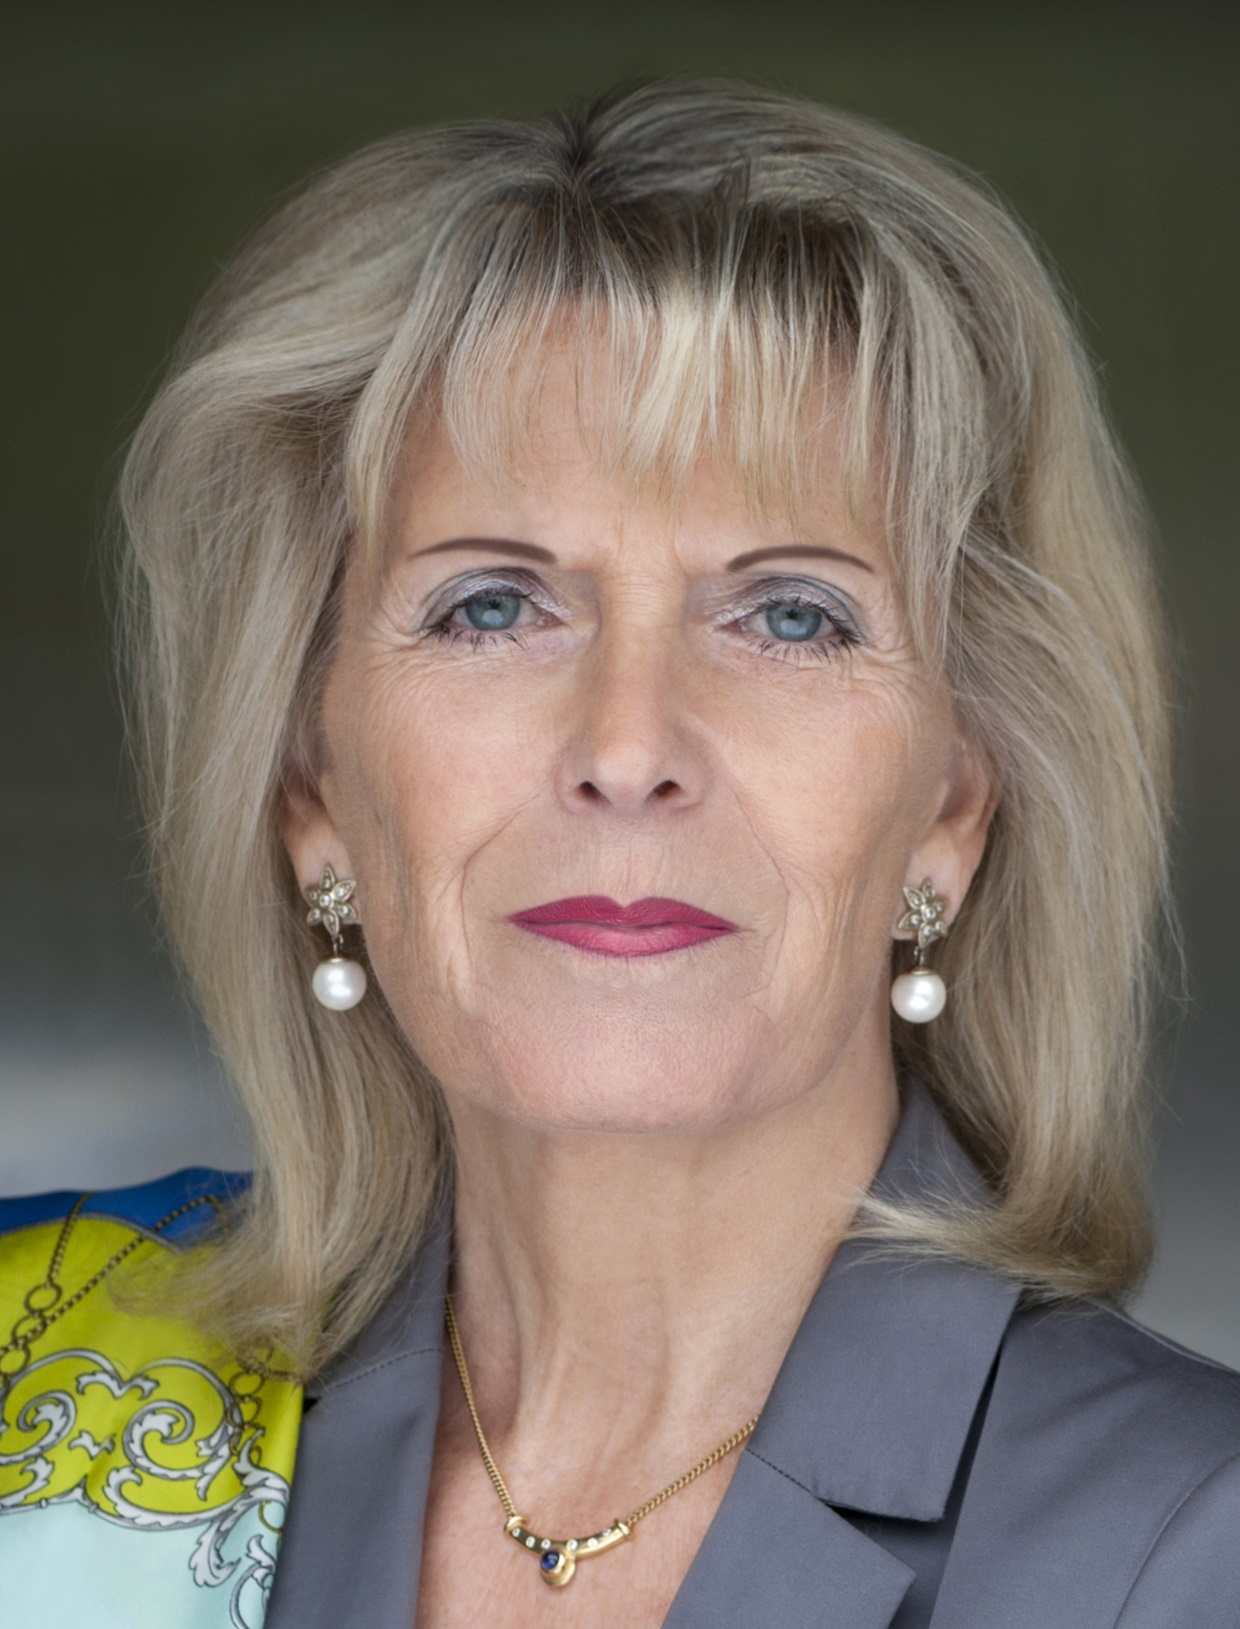 Prof. Dr. Dr. h.c. Angela D. Friederici